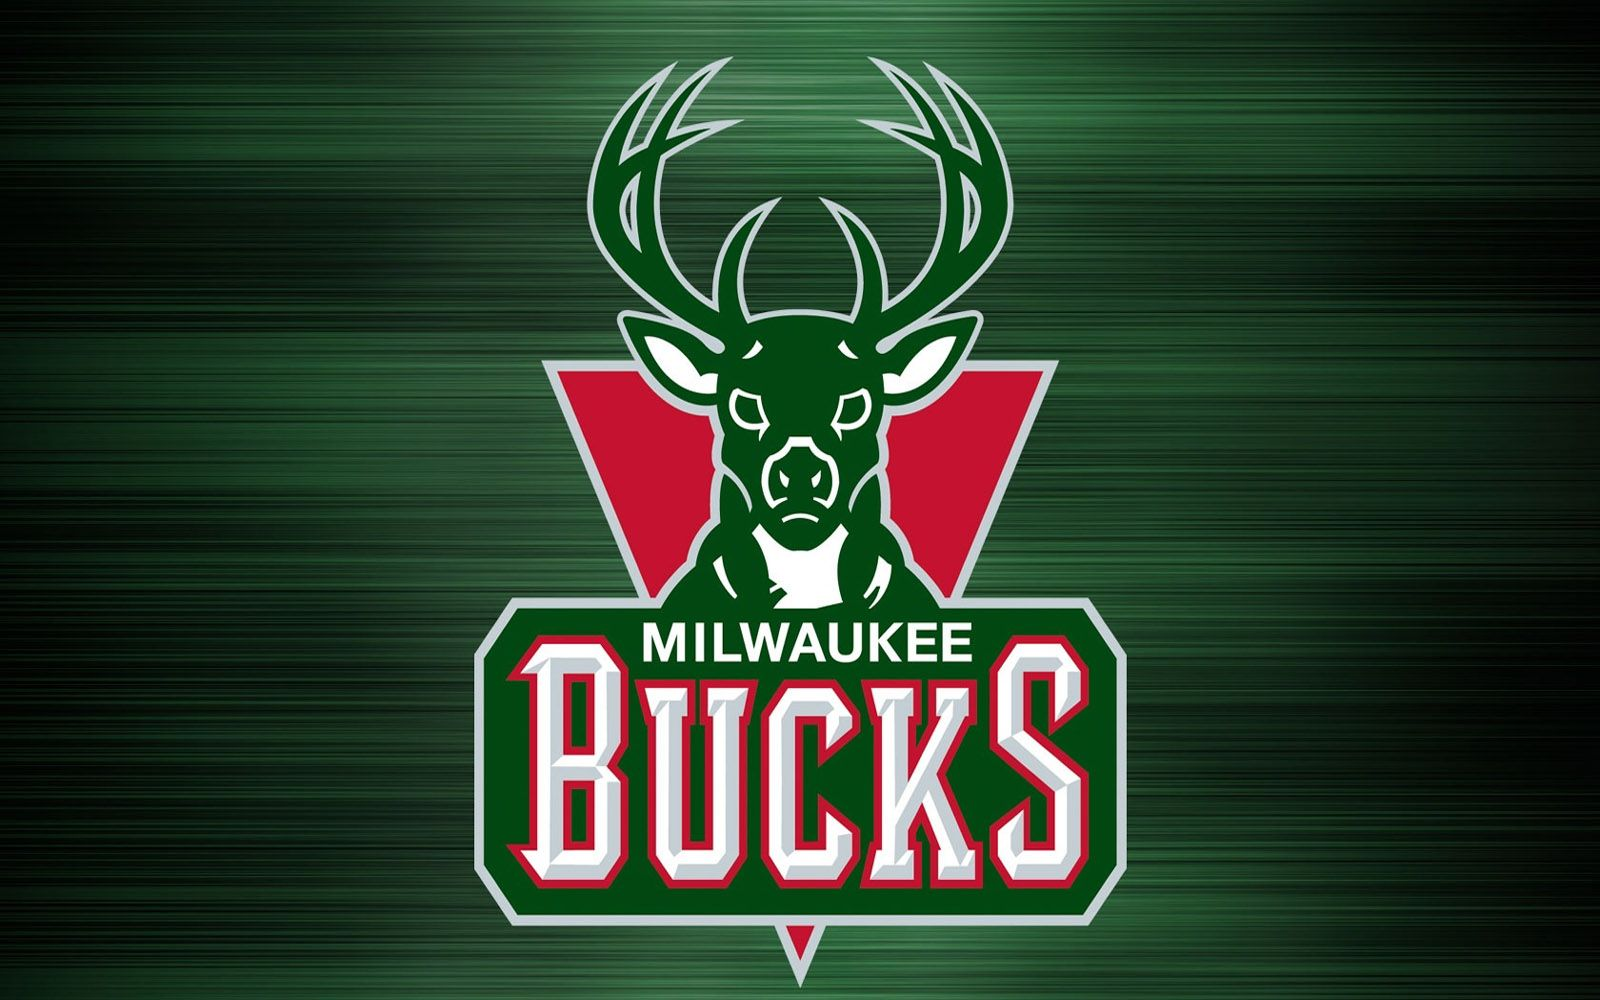 Milwaukee Bucks 2013 NBA Logo Hd Desktop Wallpaper